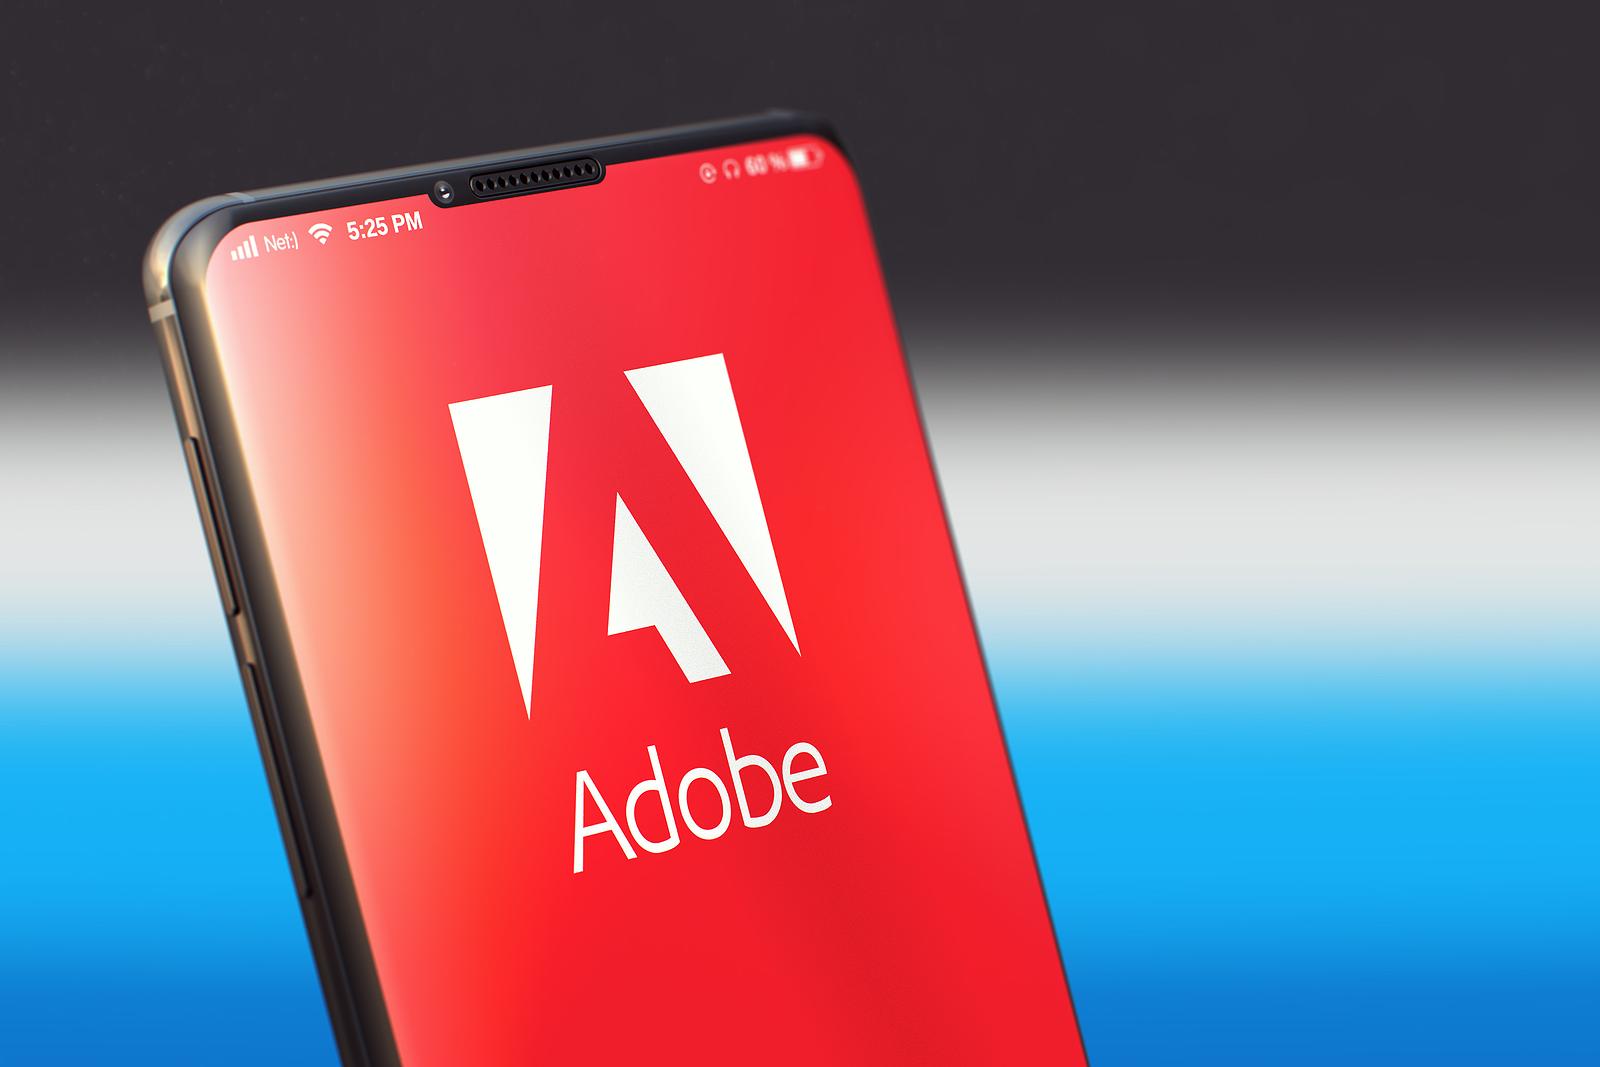 Adobe ADBE stock news and analysis